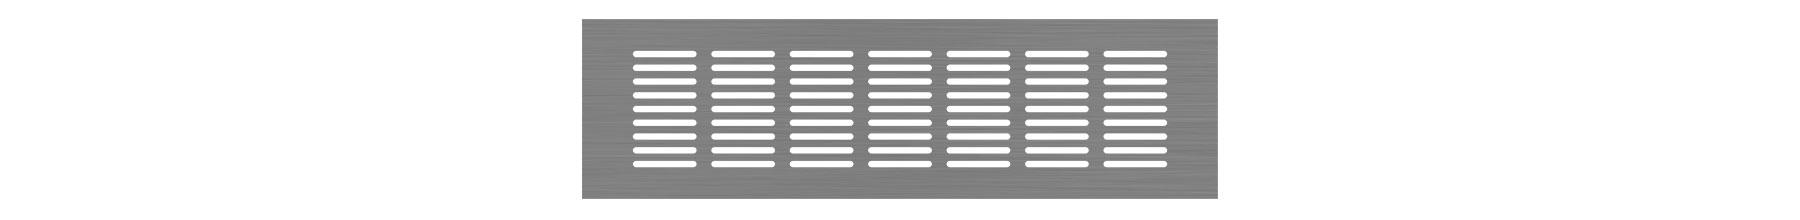 VRS-001 - Ventilaciona rešetka 85×300 mm